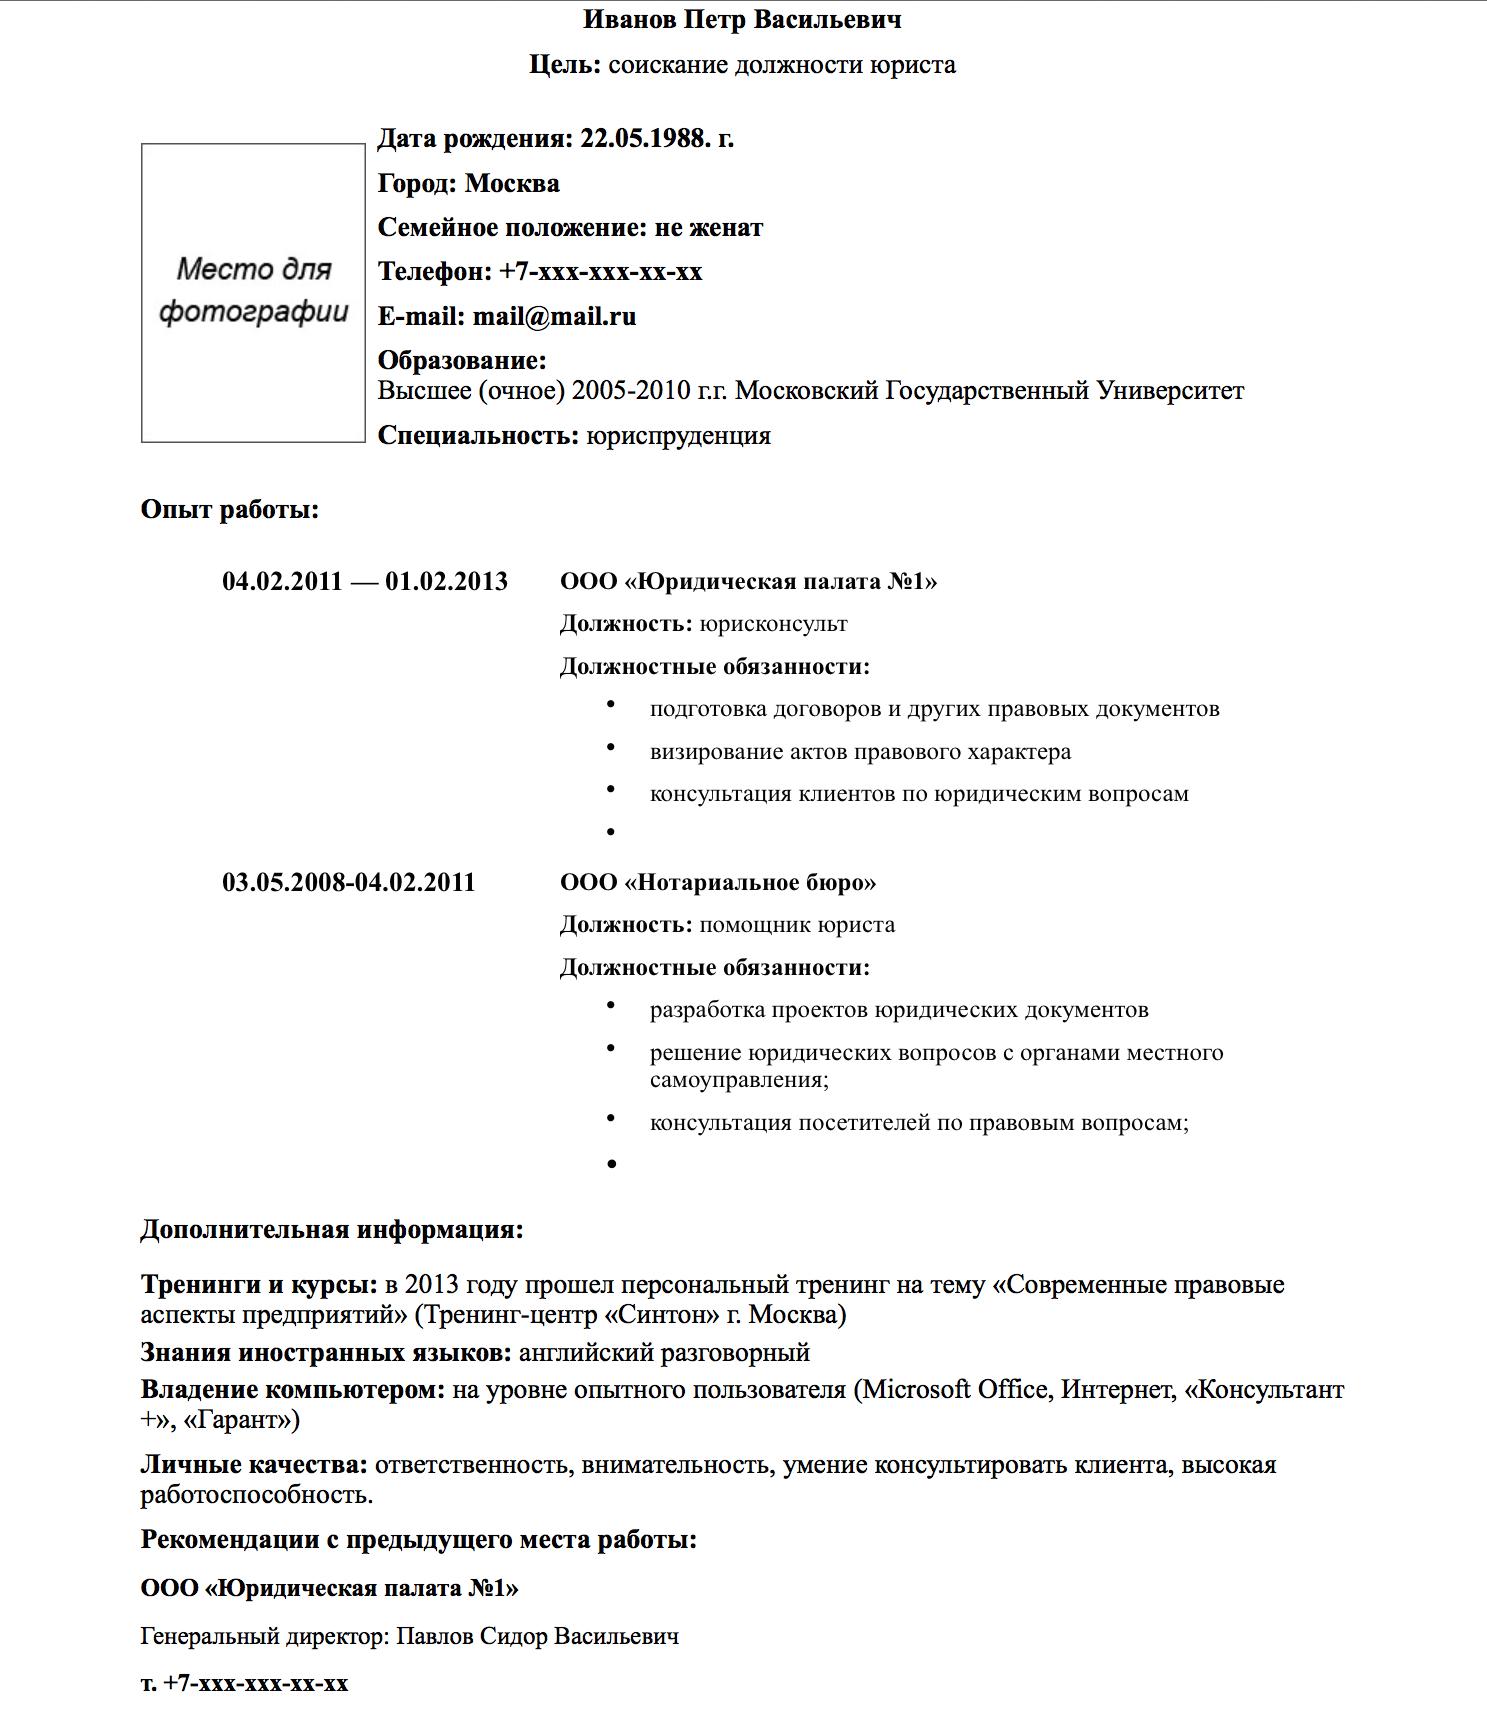 резюме юриста - шаблон